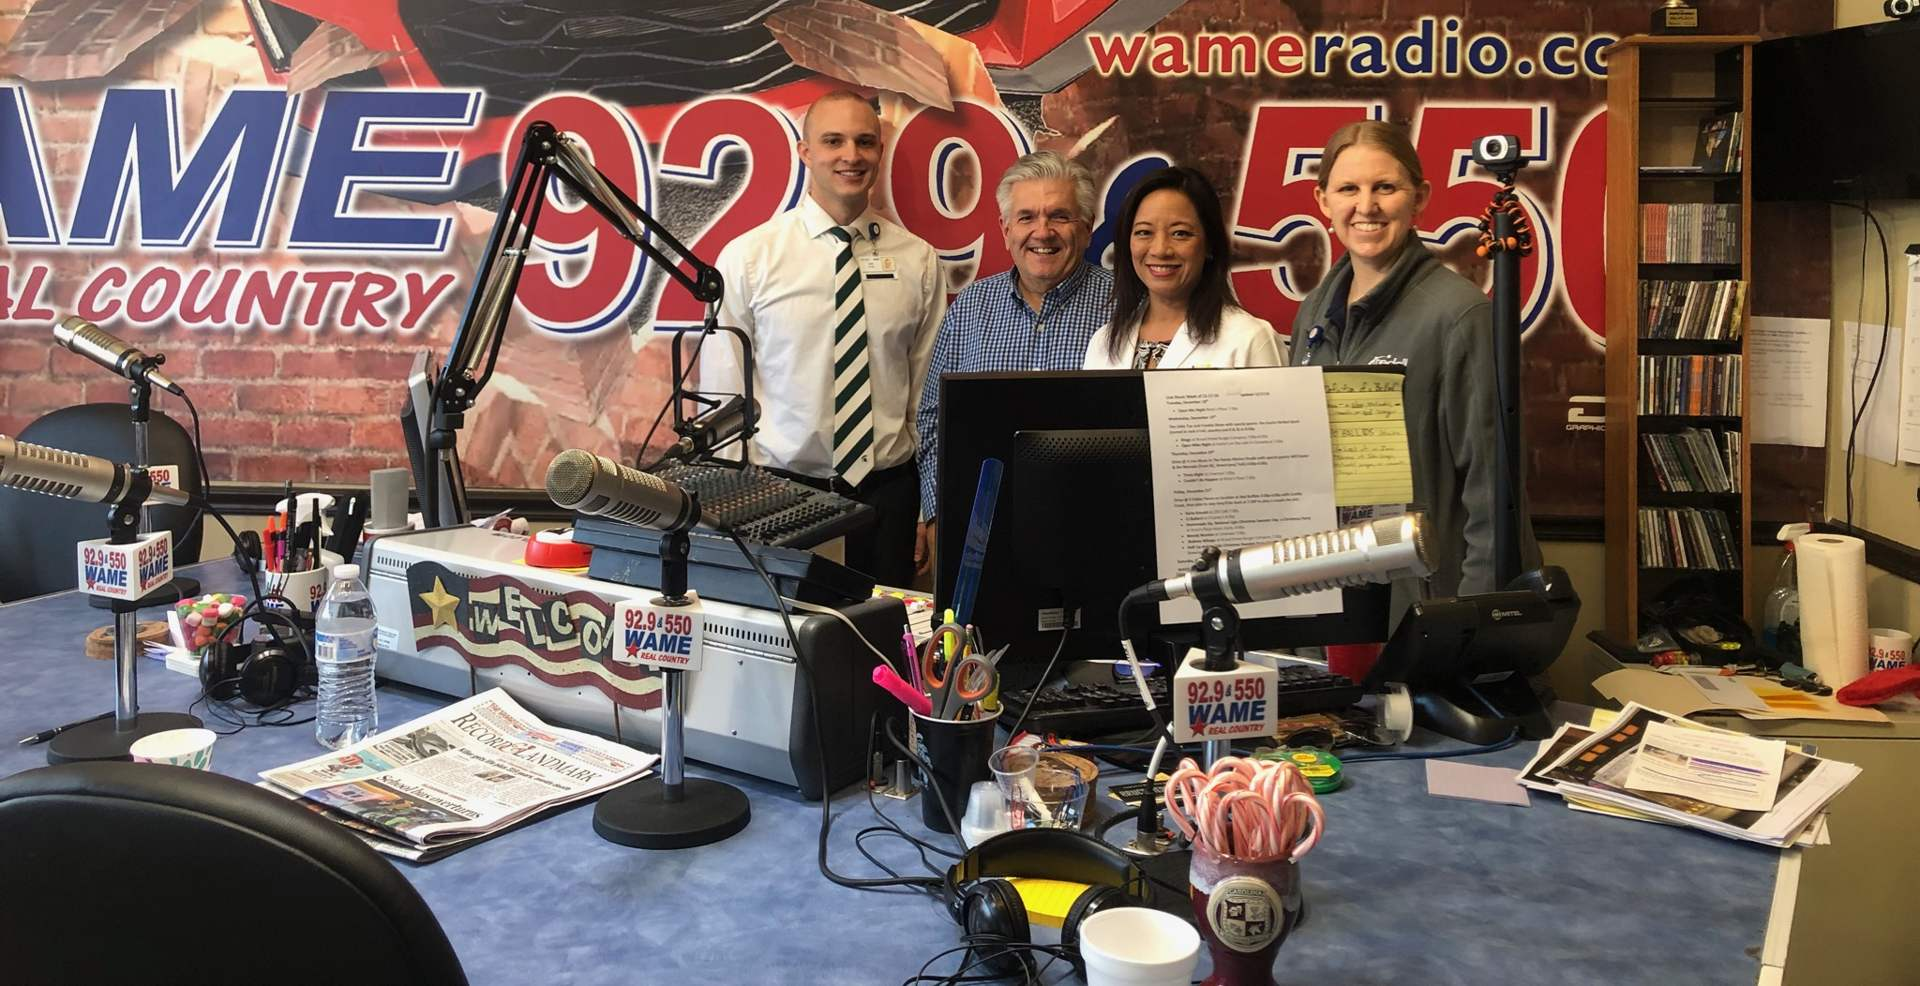 Podcast studio at WAME radio.